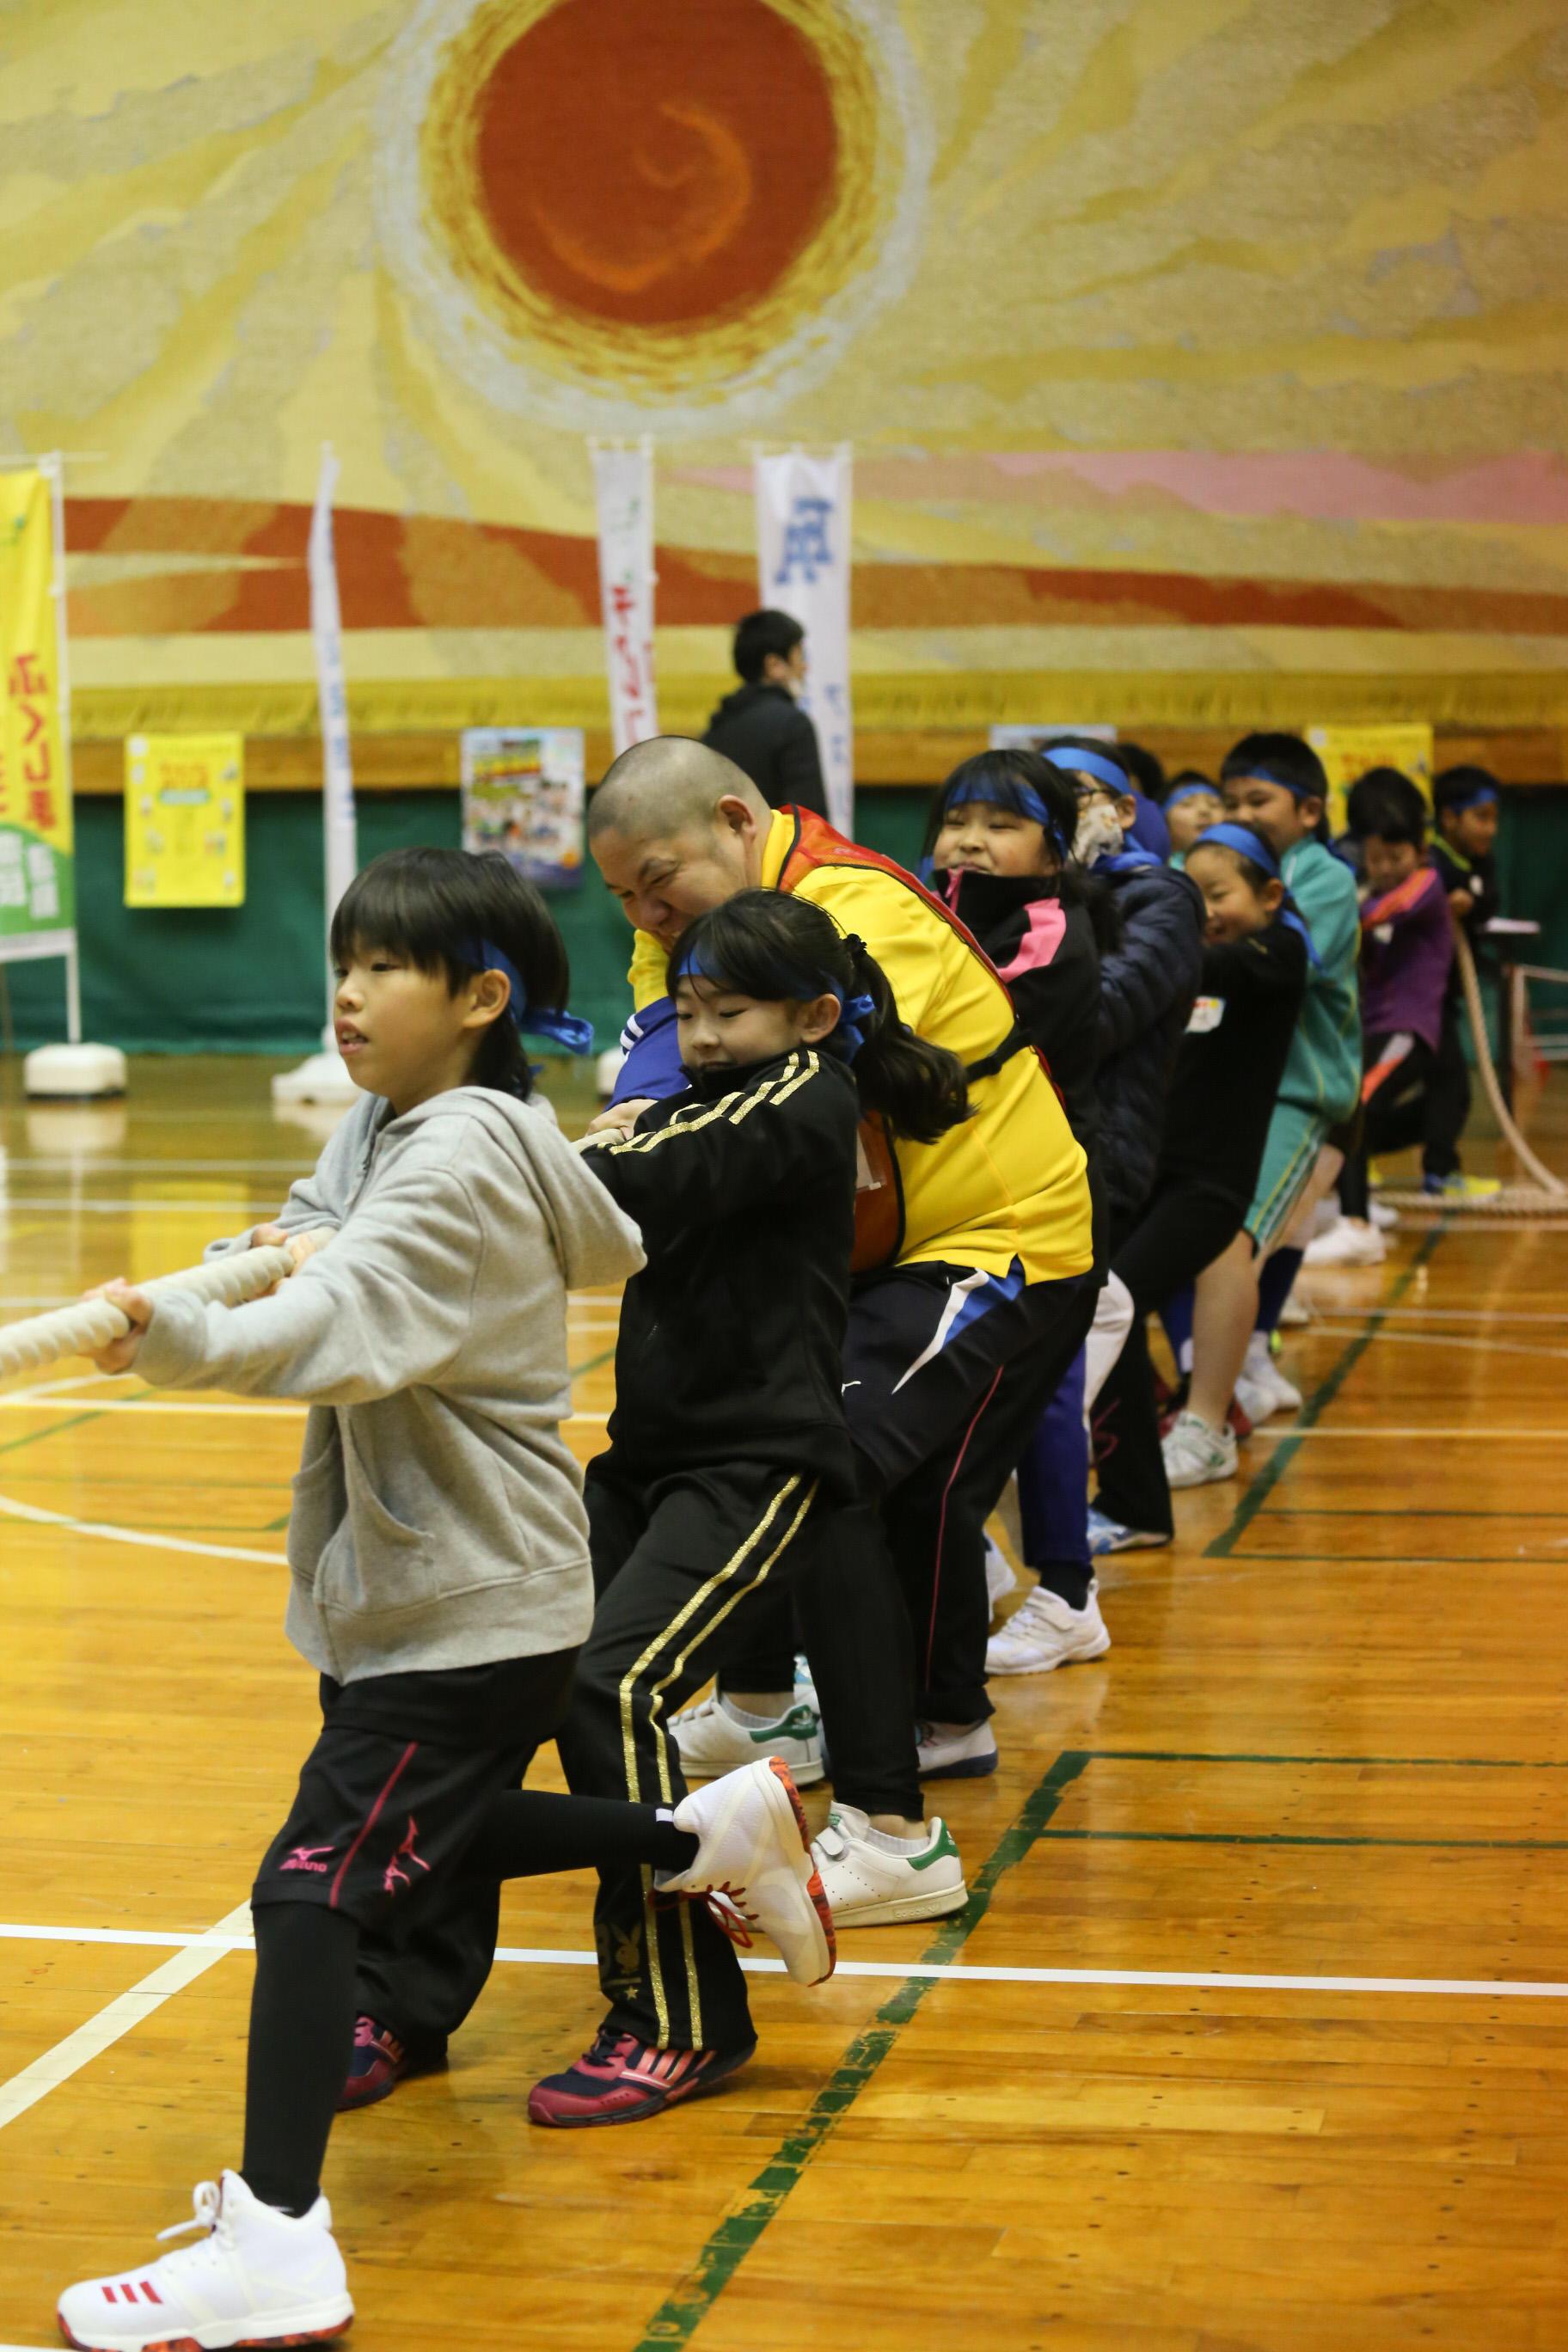 http://news.yoshimoto.co.jp/20171129023827-6e2fd9c97dcc989686faa675337ad86e19694ef6.jpg